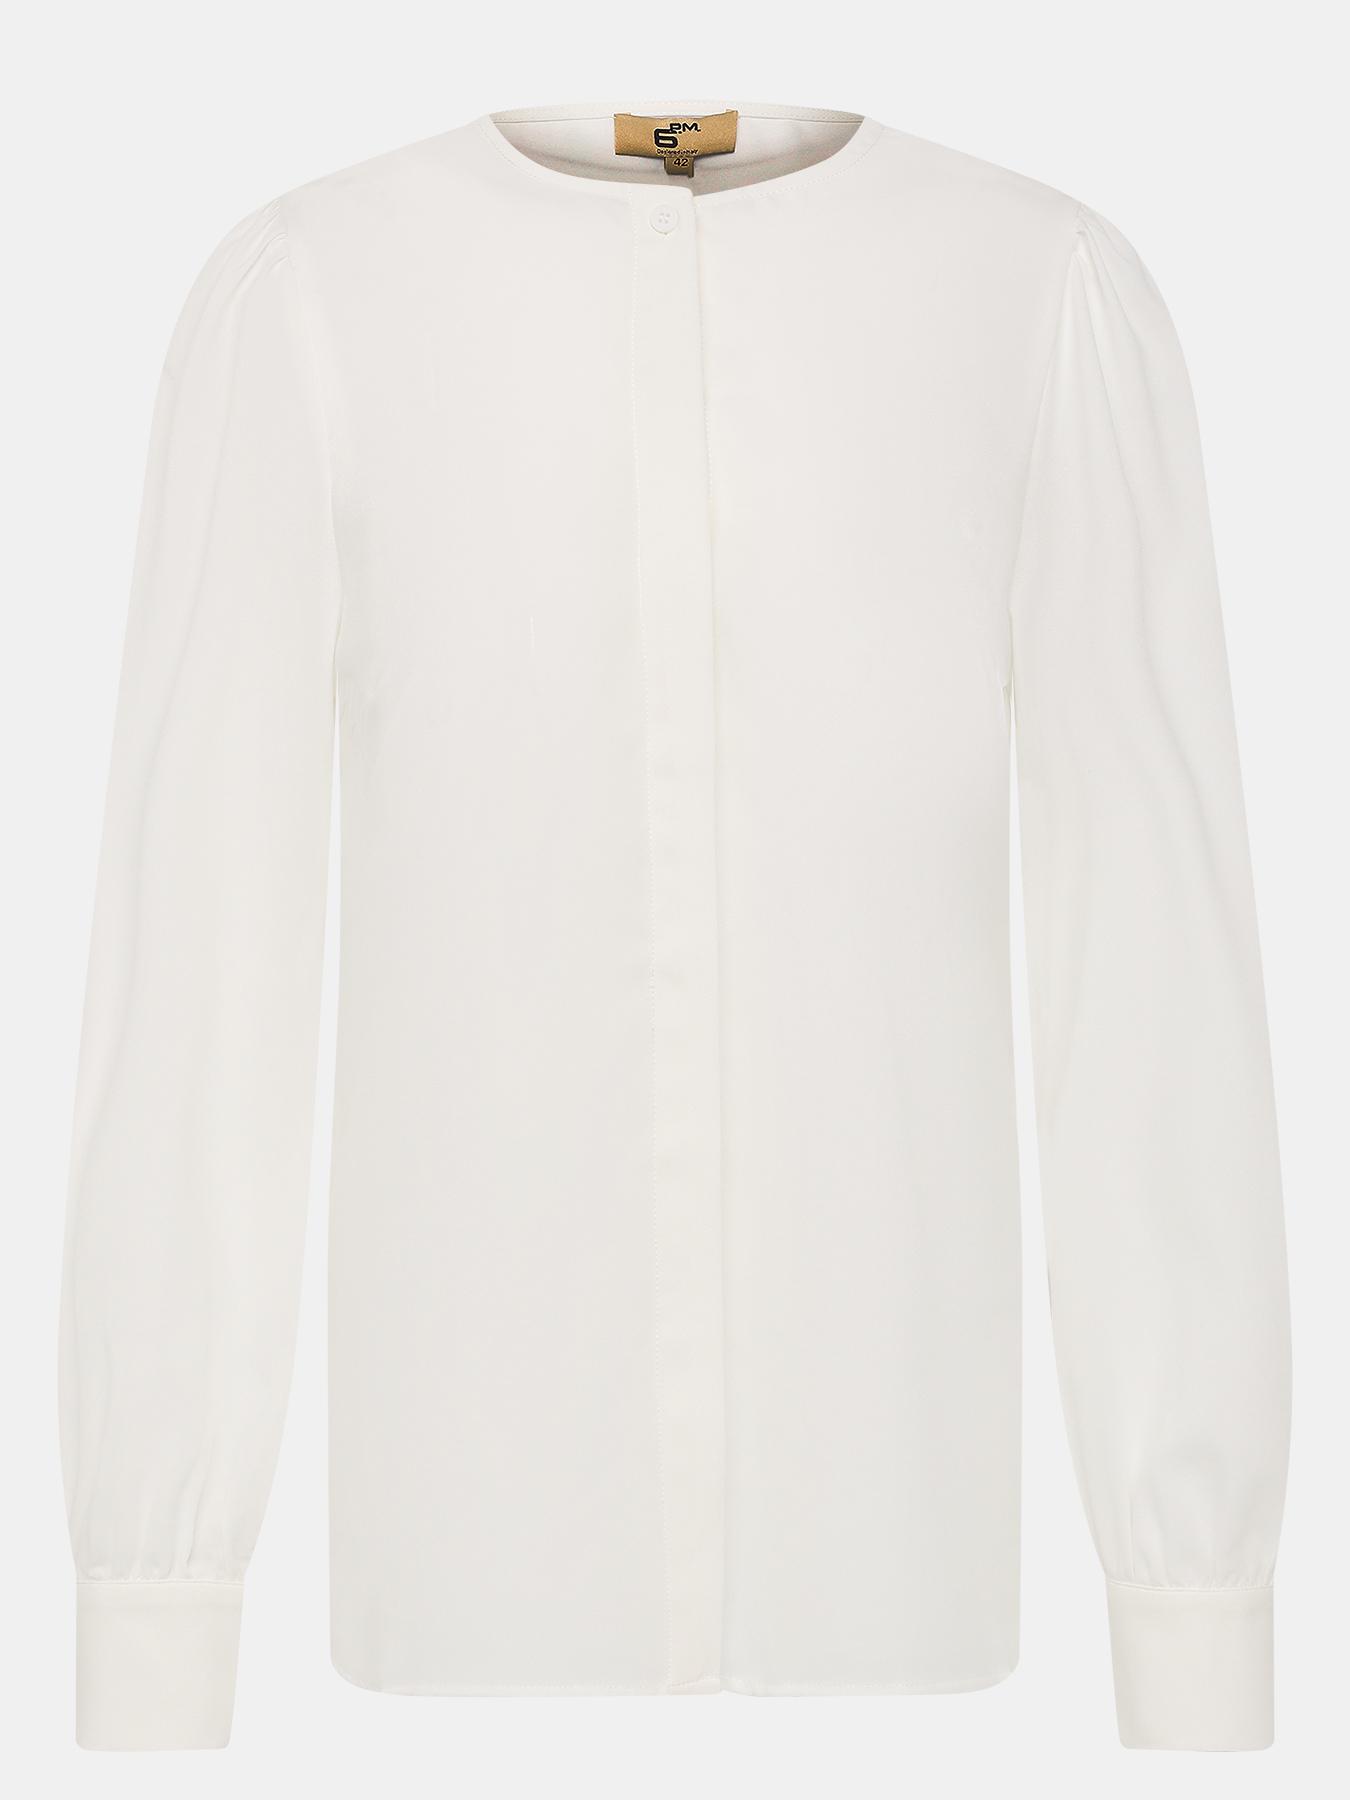 Блузки 6 P.M. Блузка 6 5 lab блузка